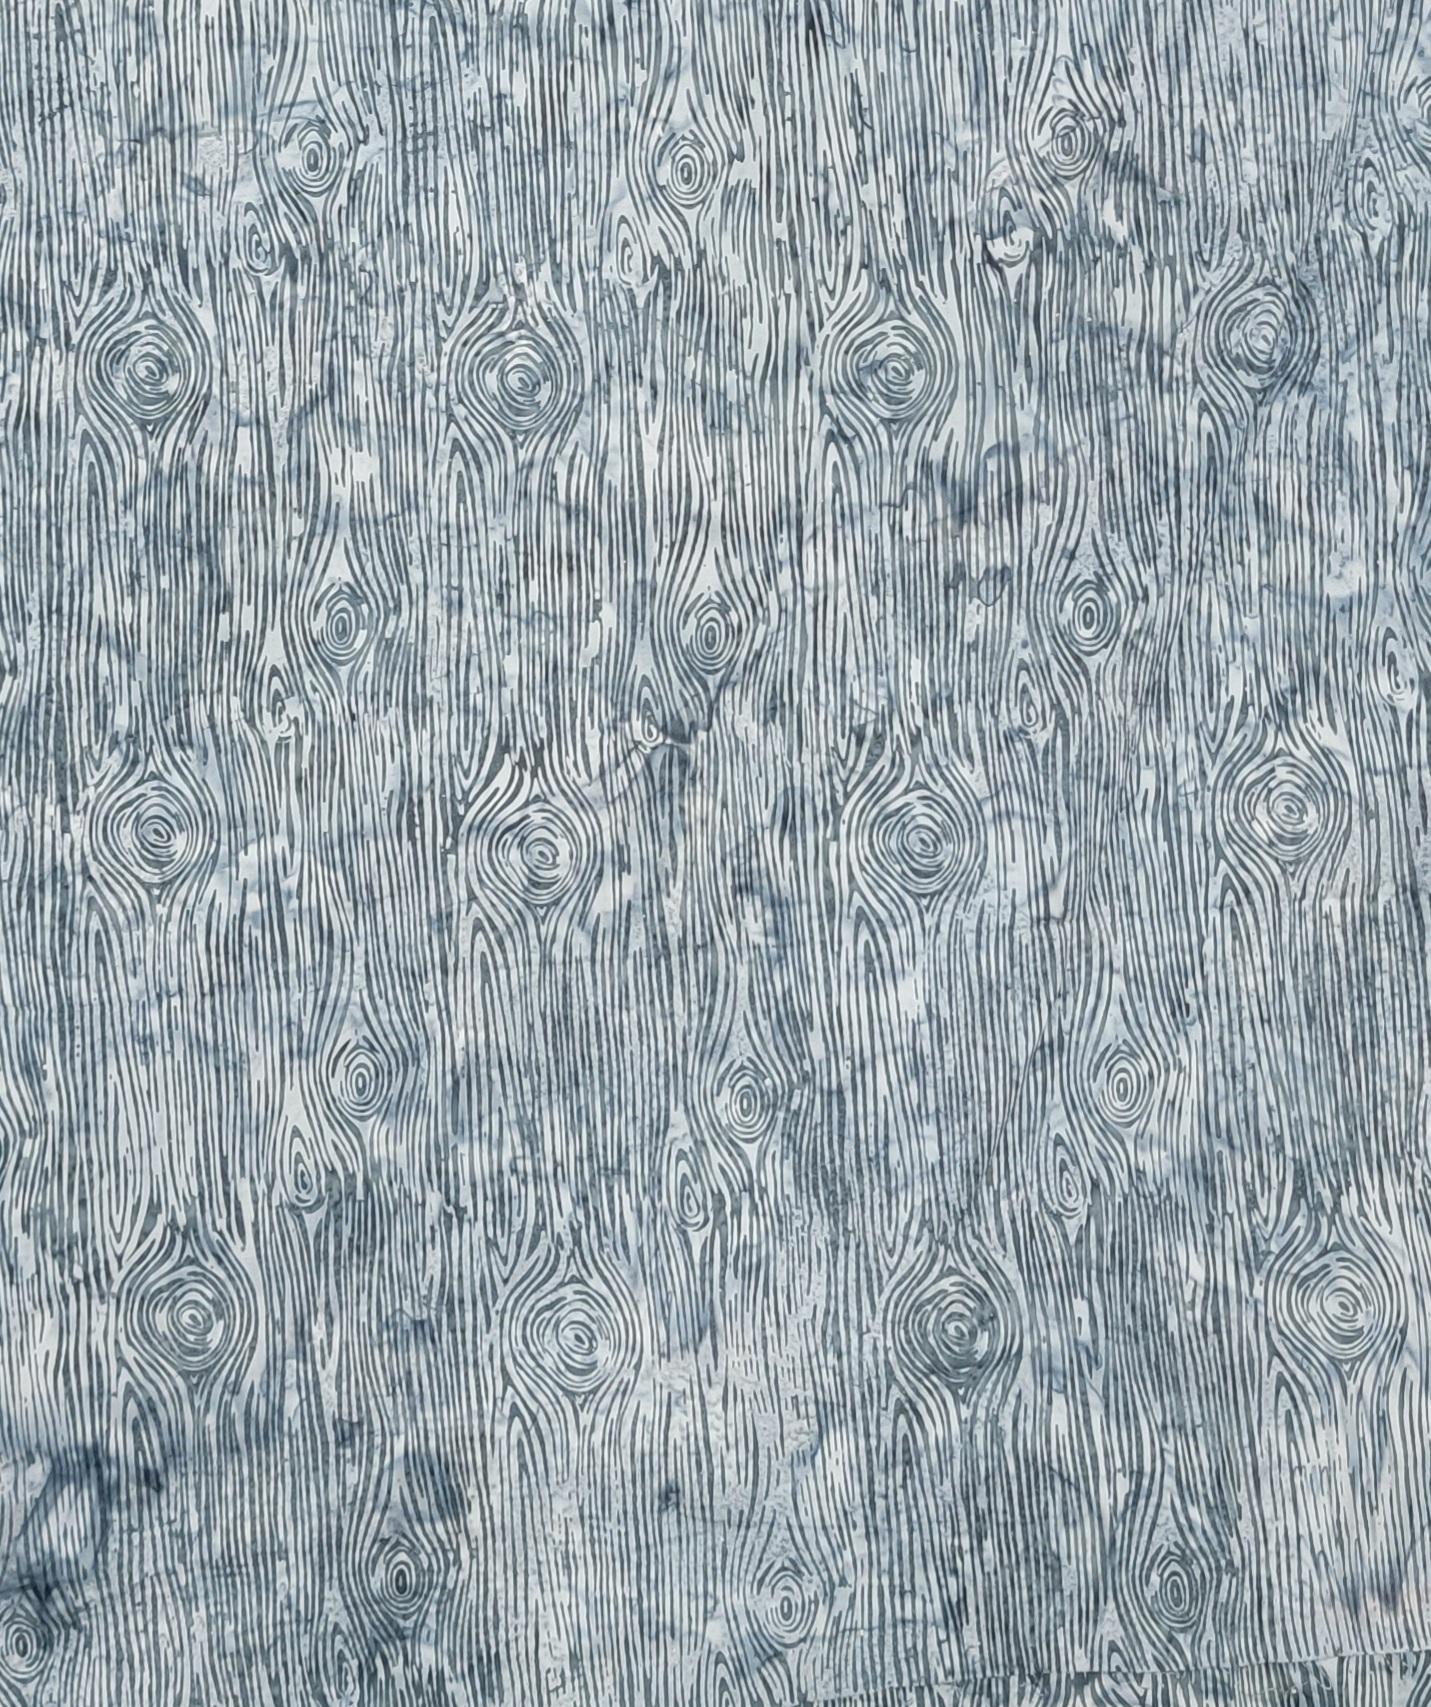 Hoffman R2235-76 Pewter Wood Grain Batik